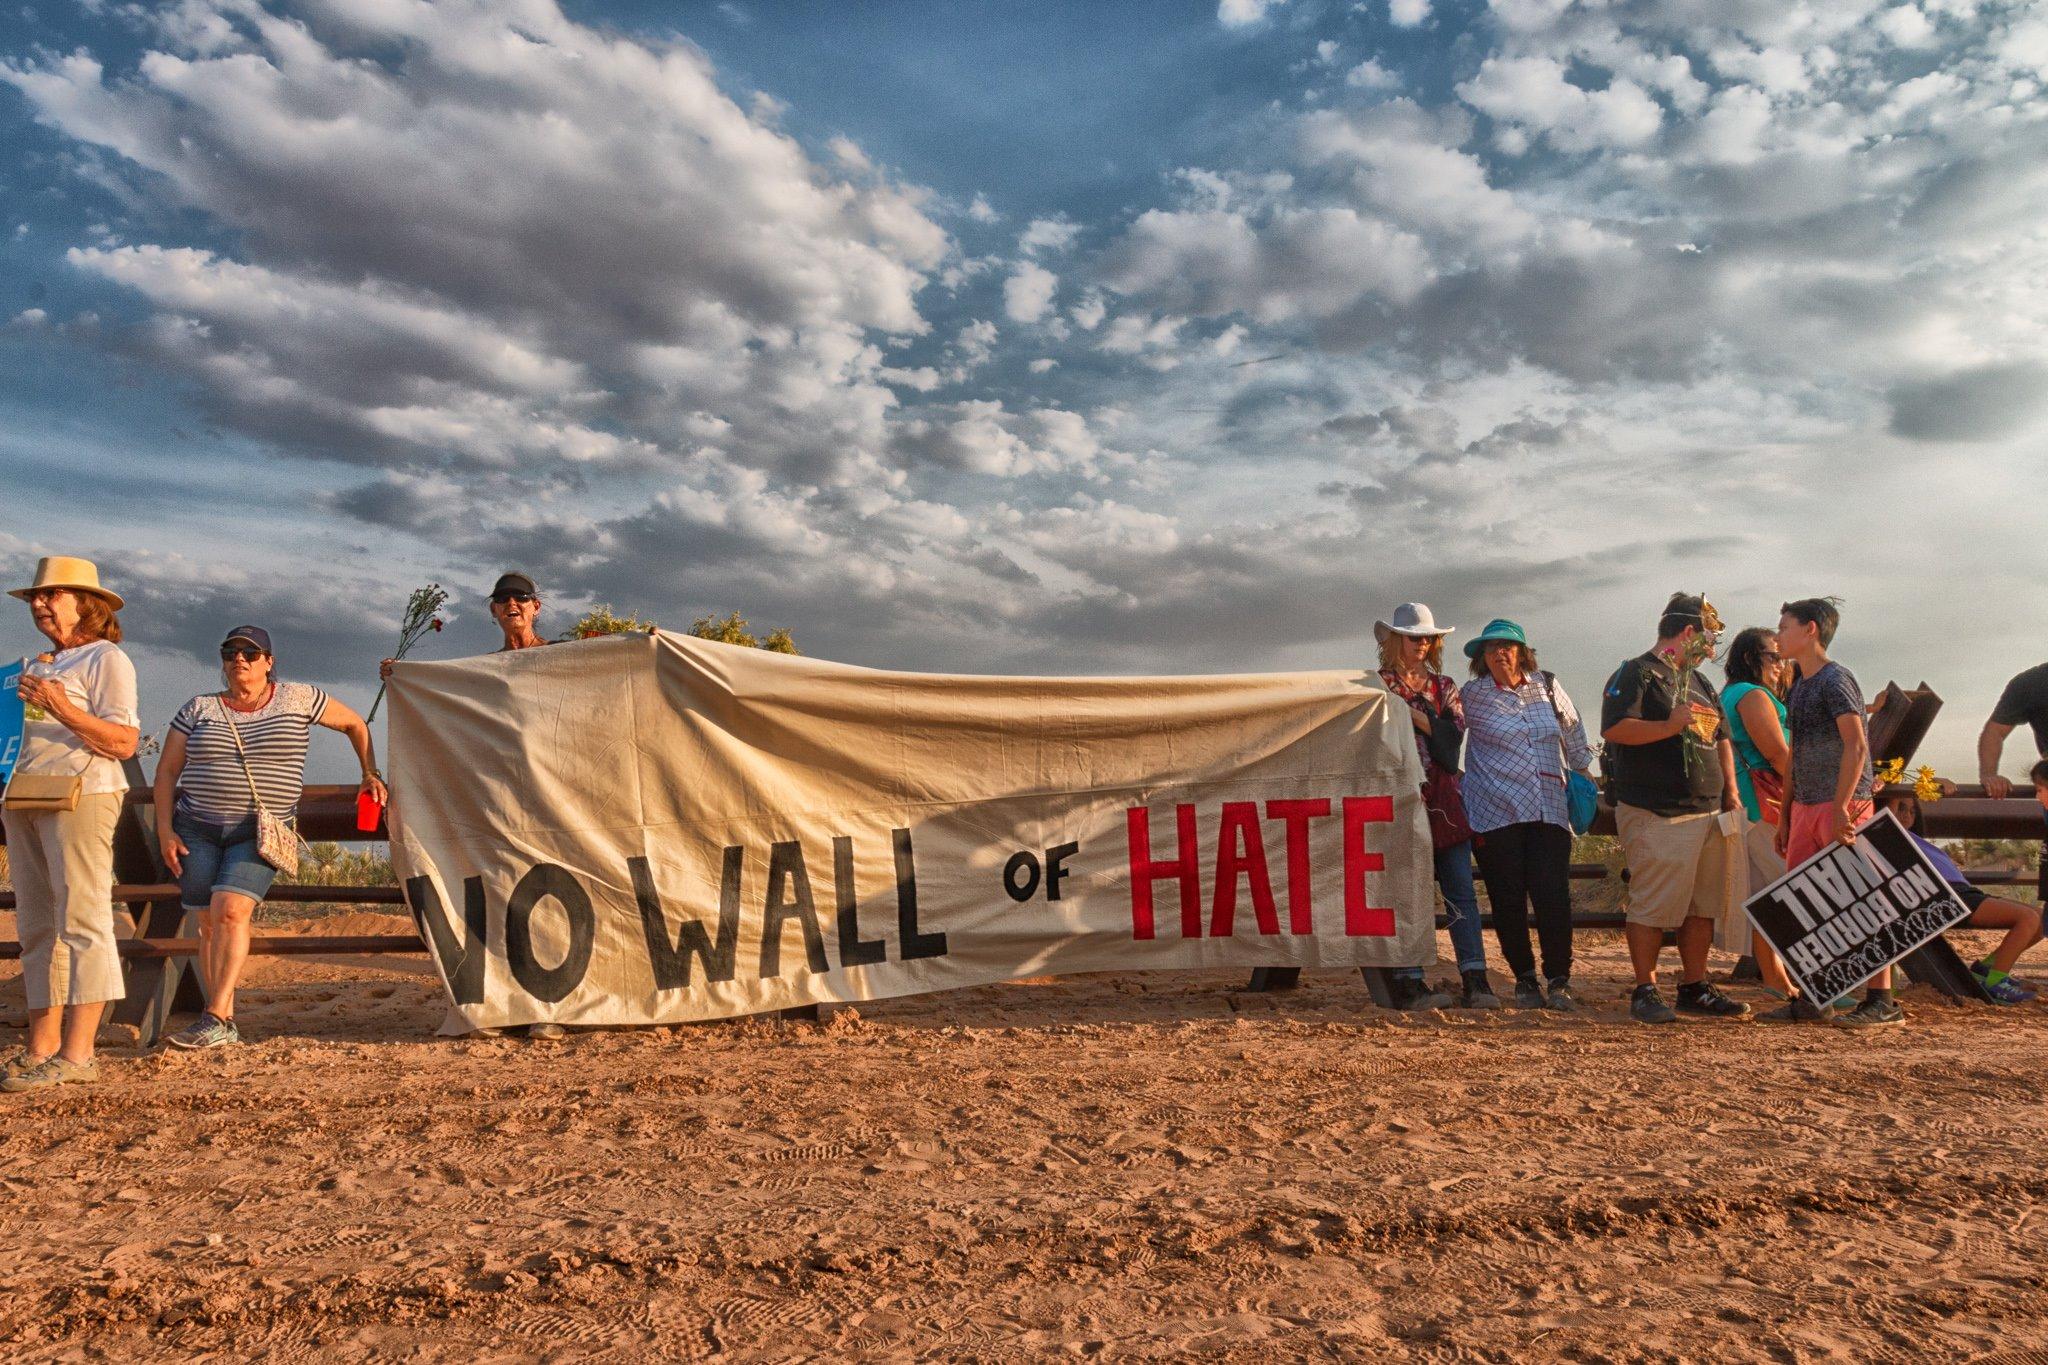 Tell Congress: Don't Waste BILLIONS on Border Walls — AddUp.org